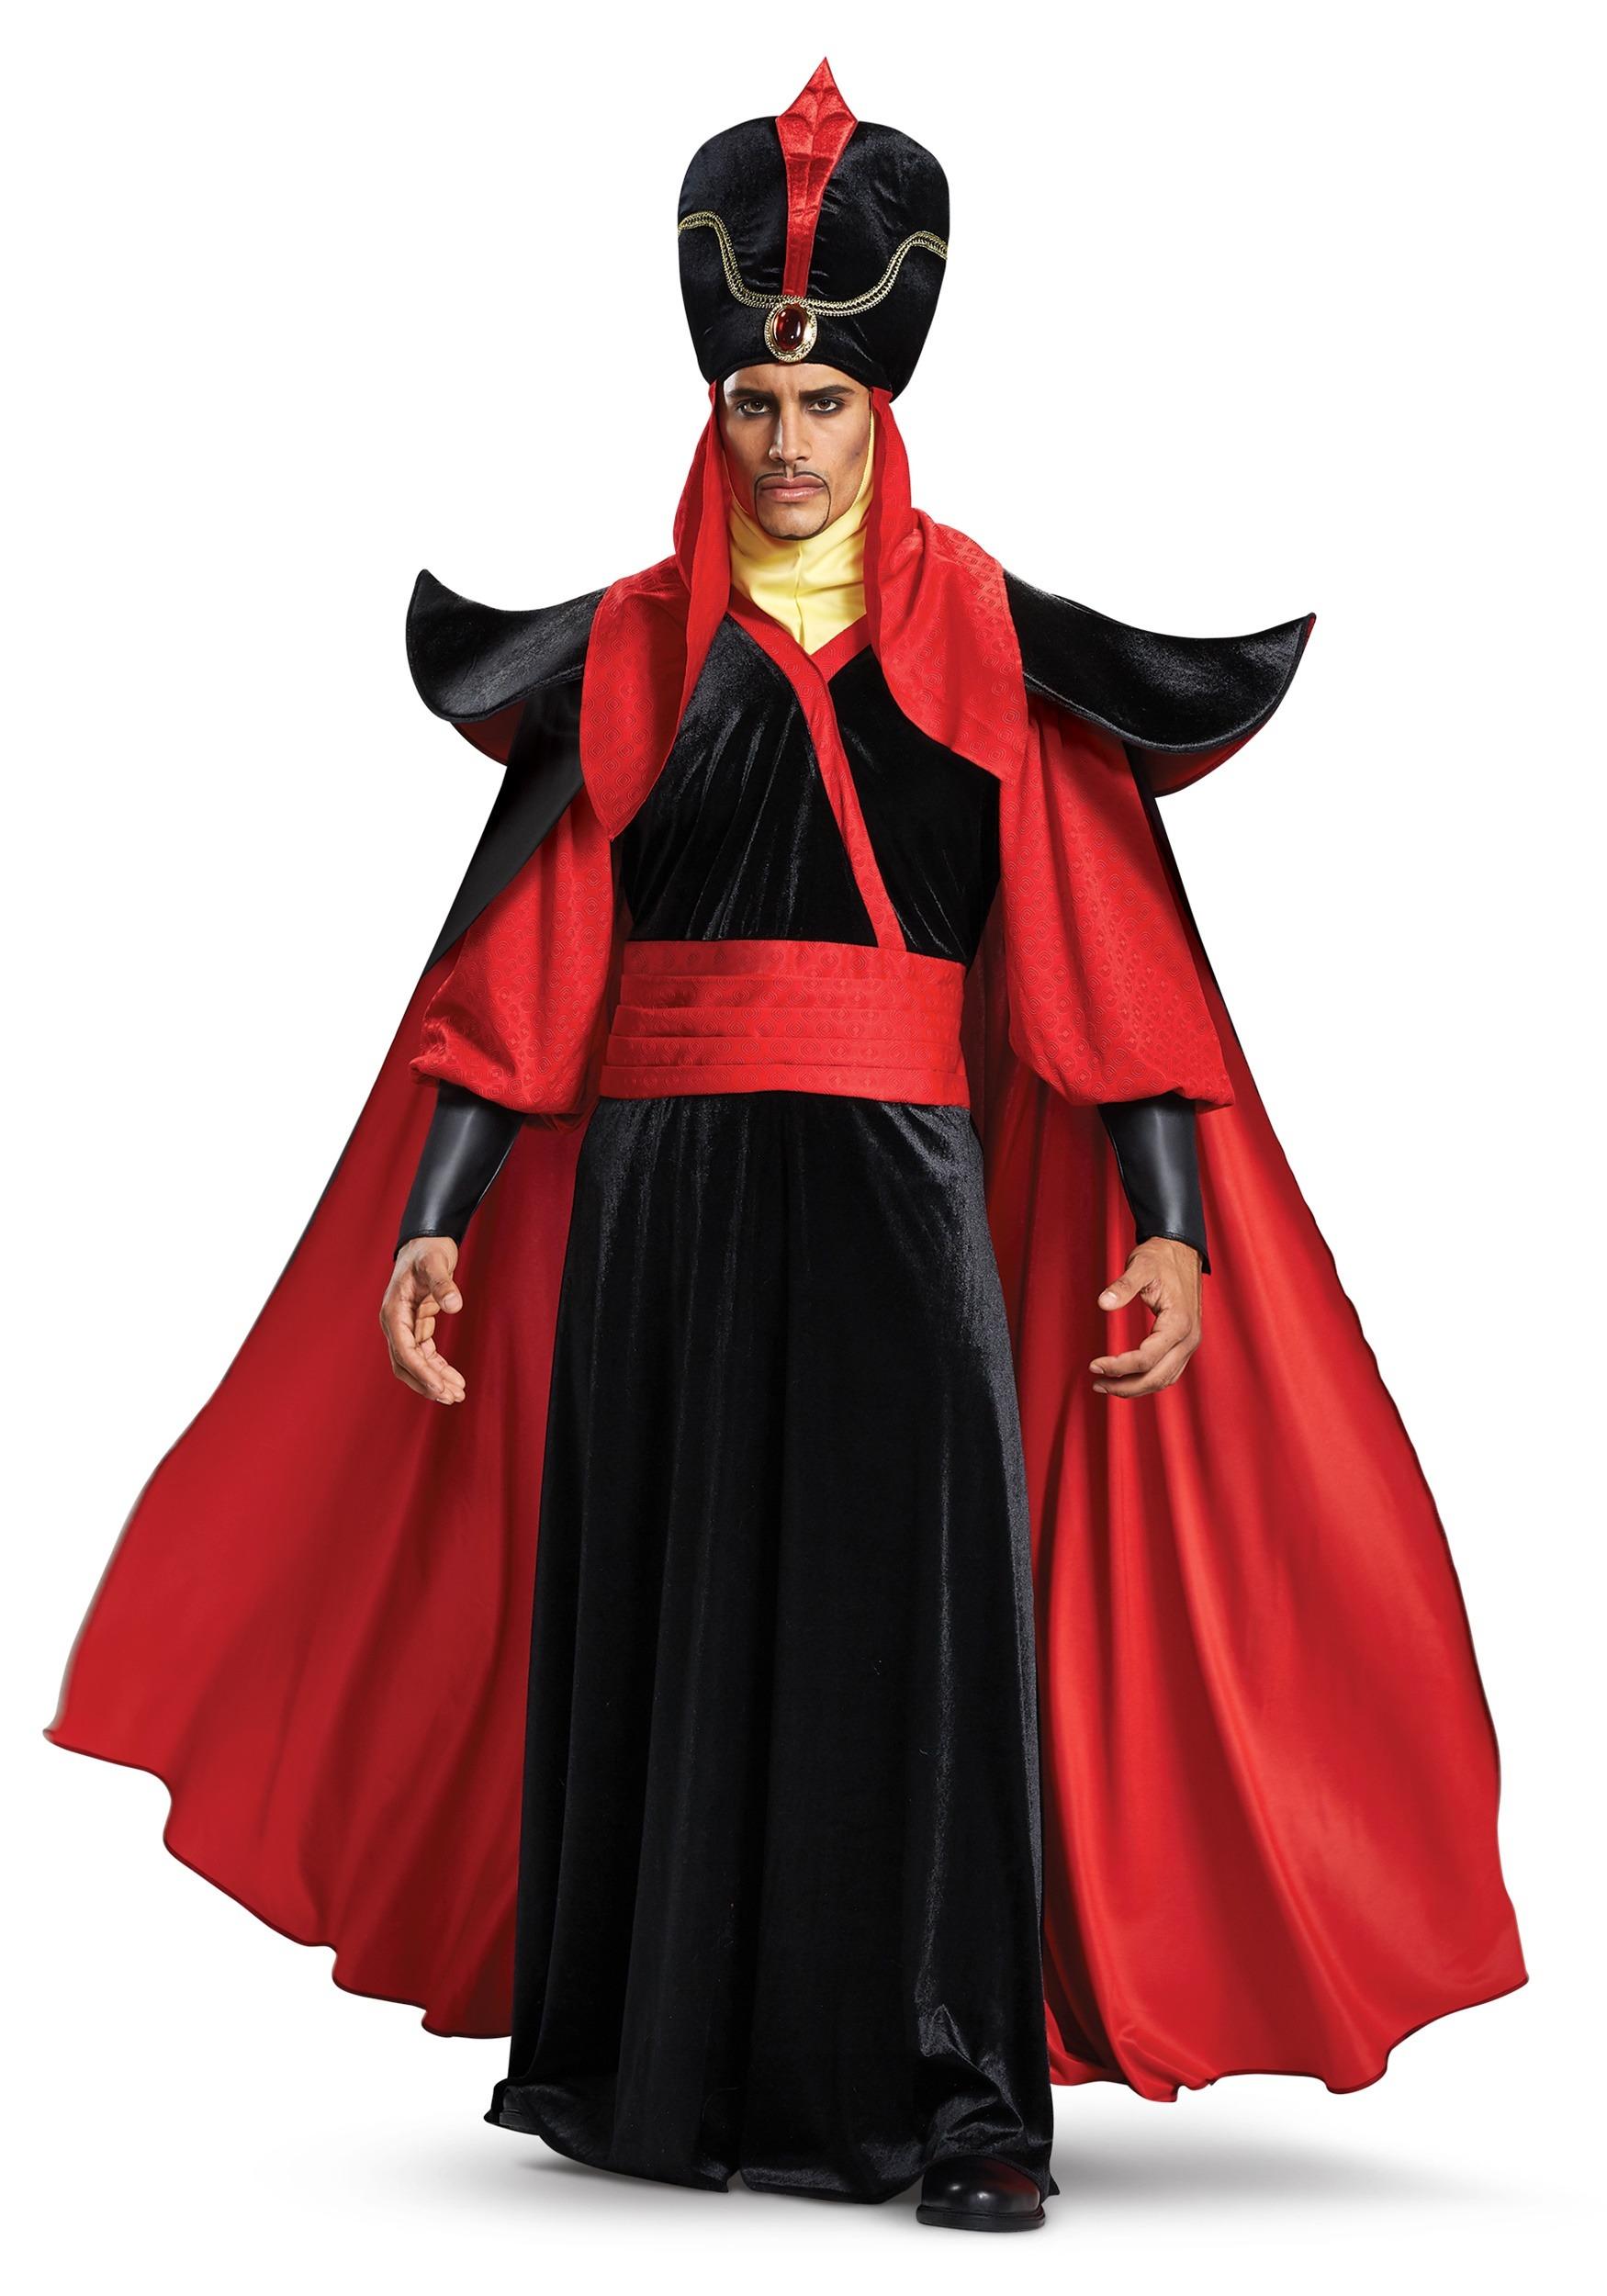 Disfraz de Jafar de Aladdin de Disney para hombre